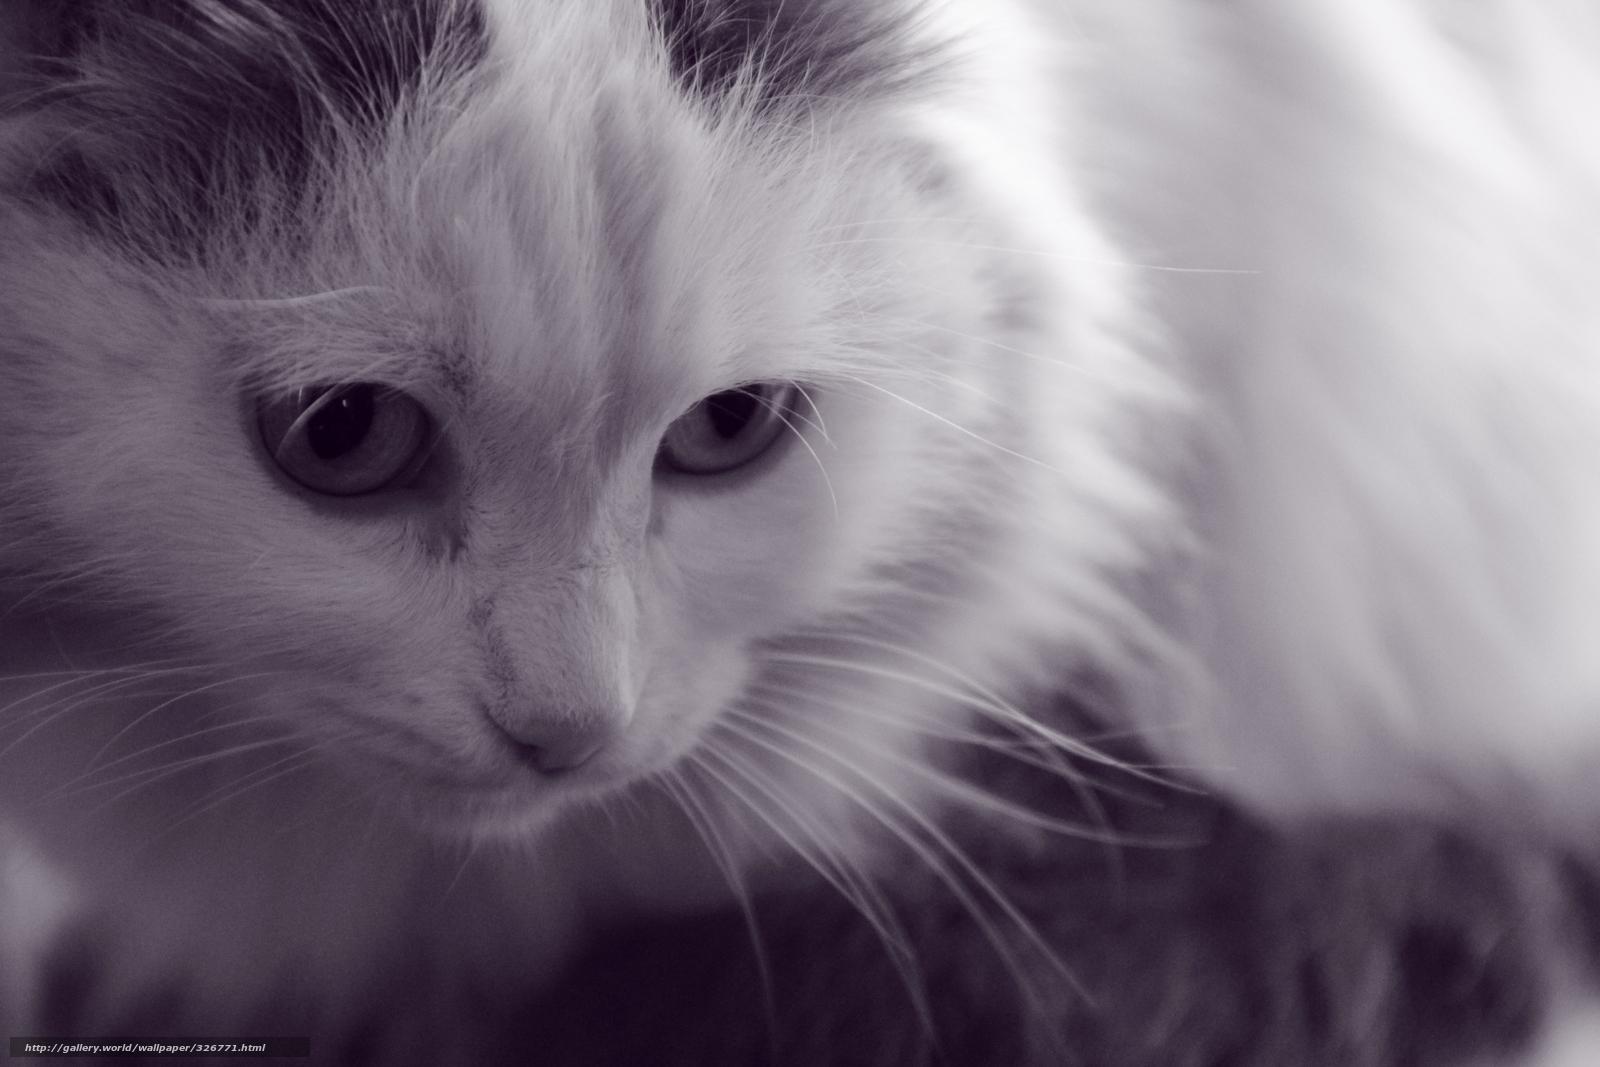 Tlcharger fond d 39 ecran chat blanc animaux fonds d 39 ecran for Bureau fond d ecran